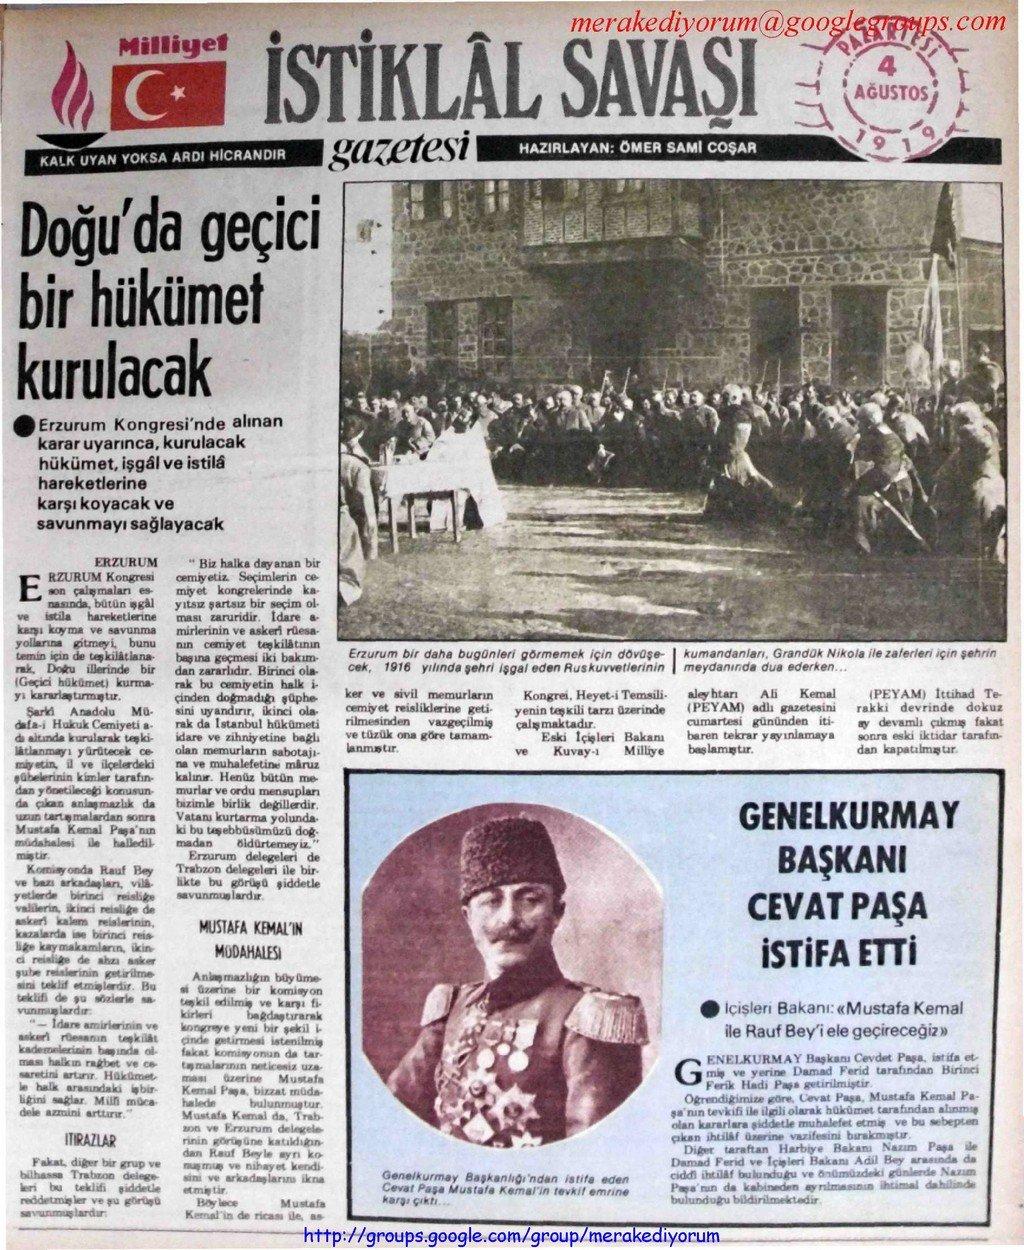 istiklal savaşı gazetesi - 4 ağustos 1919